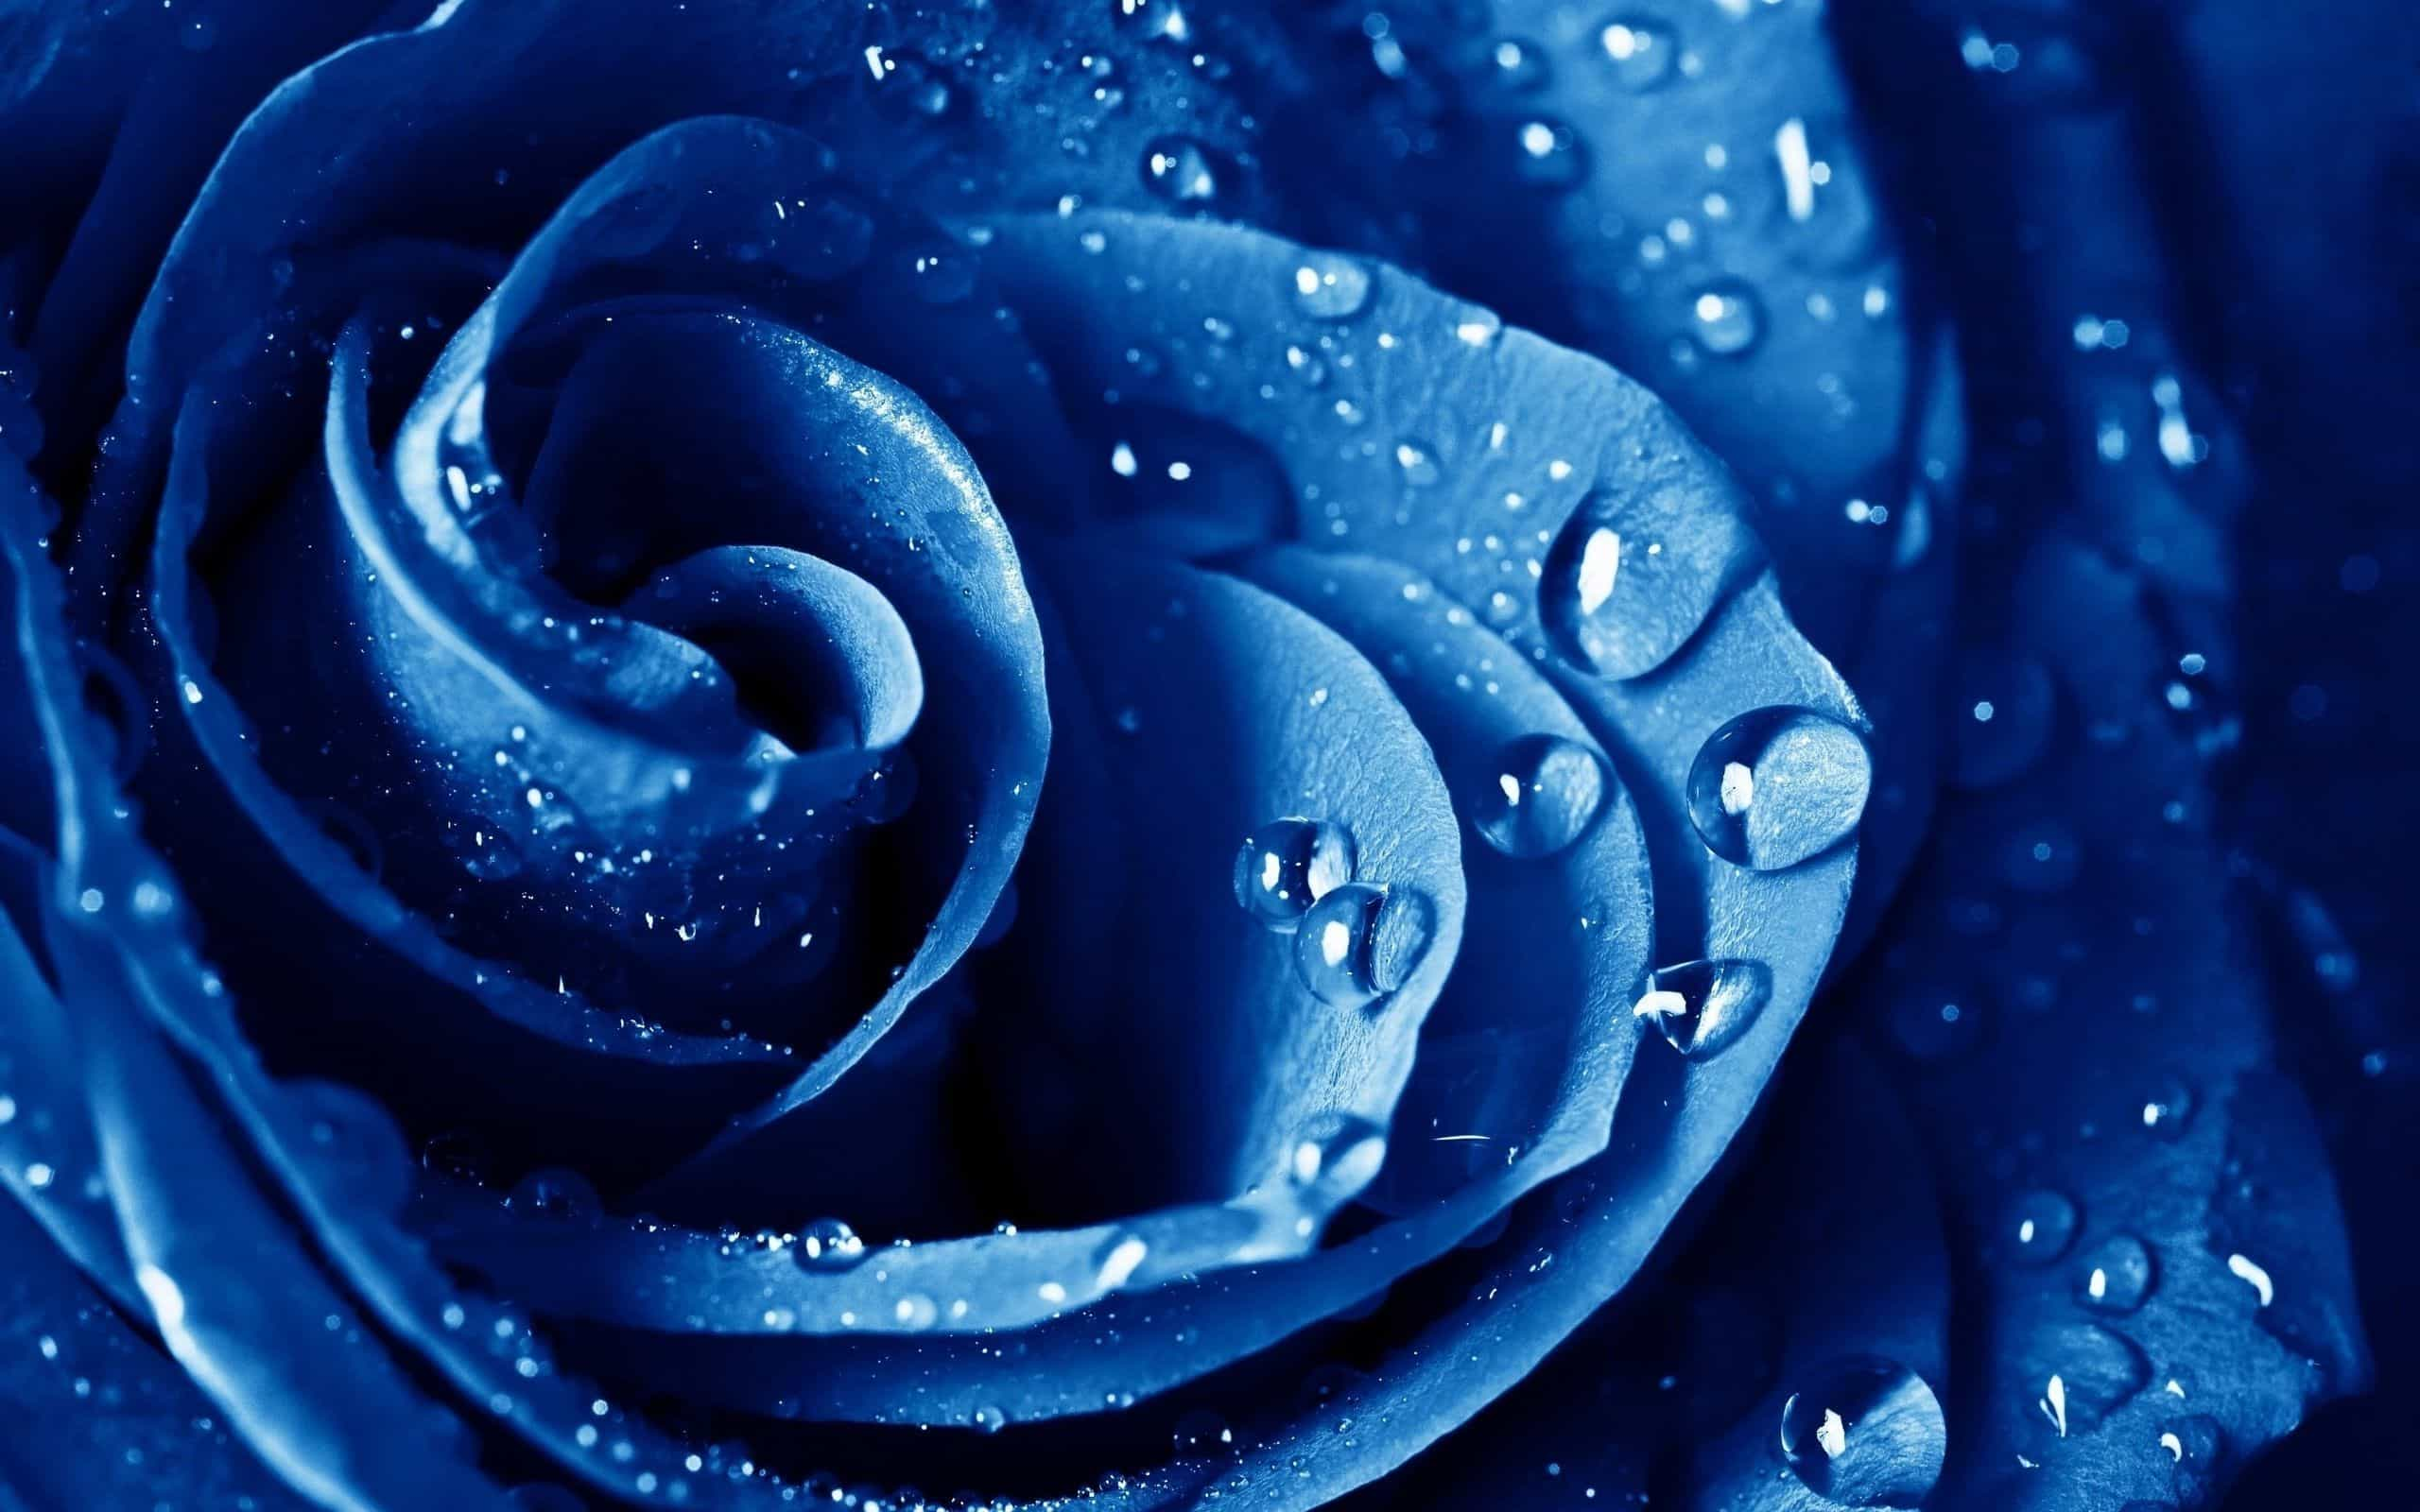 Синие лепестки